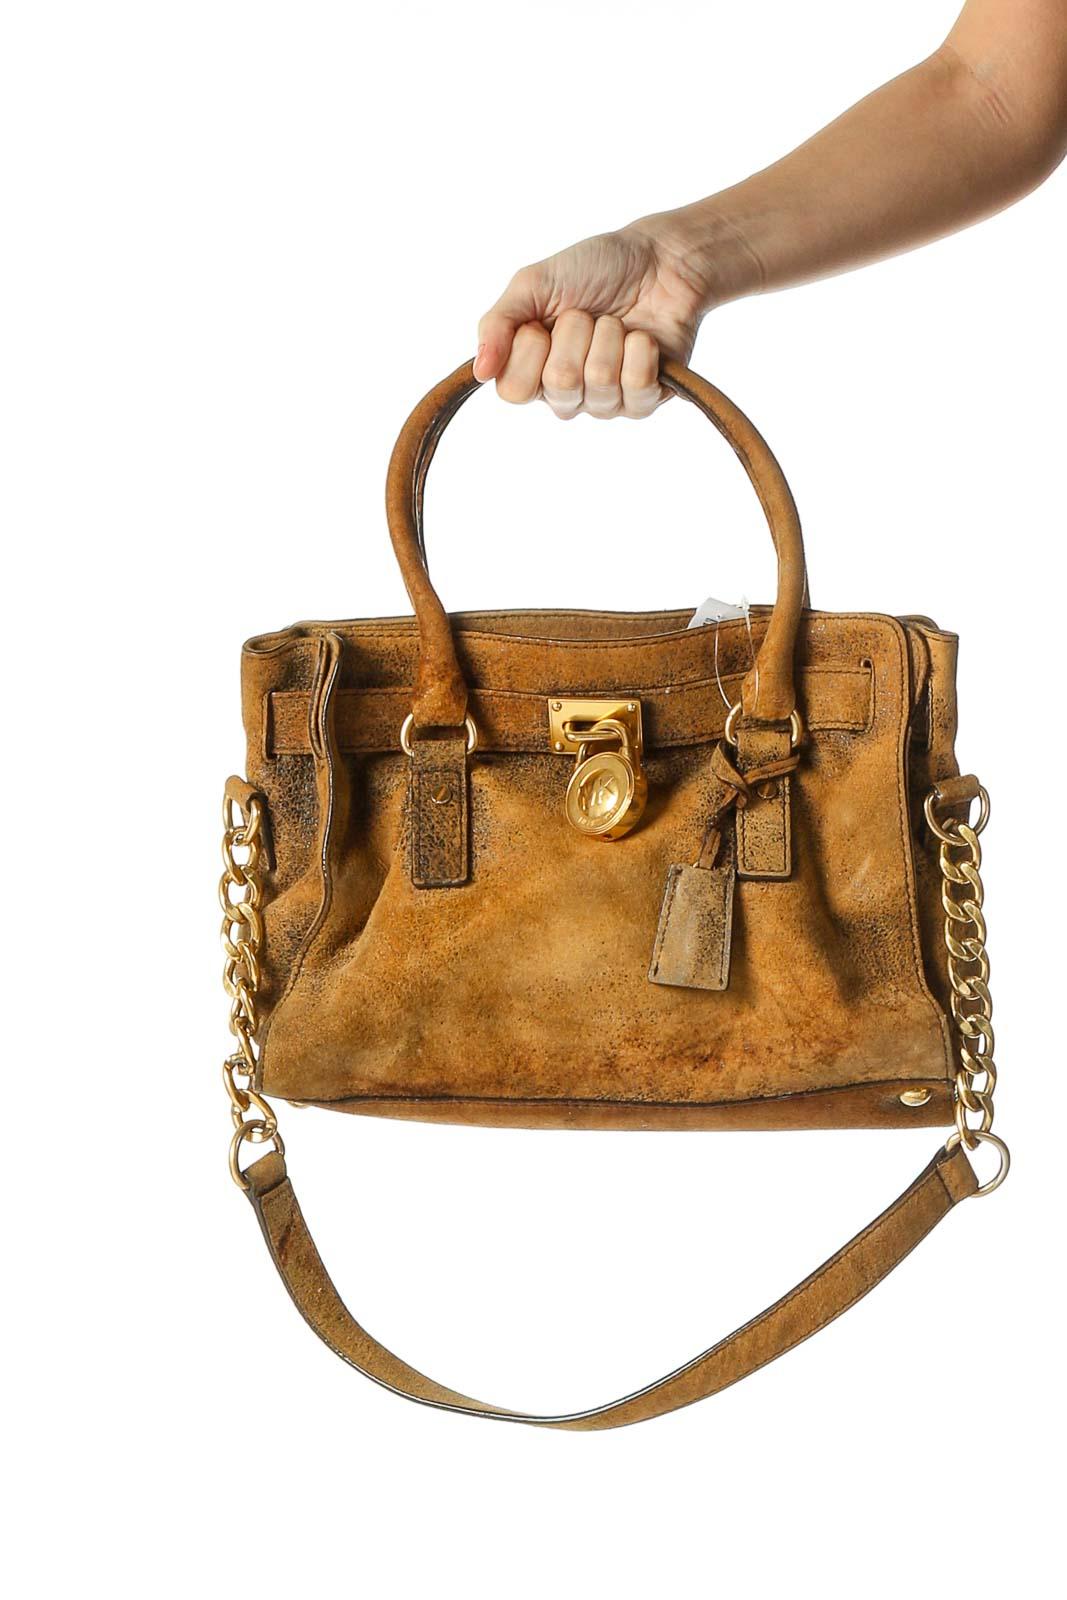 Brown Suede Leather Handbag Front